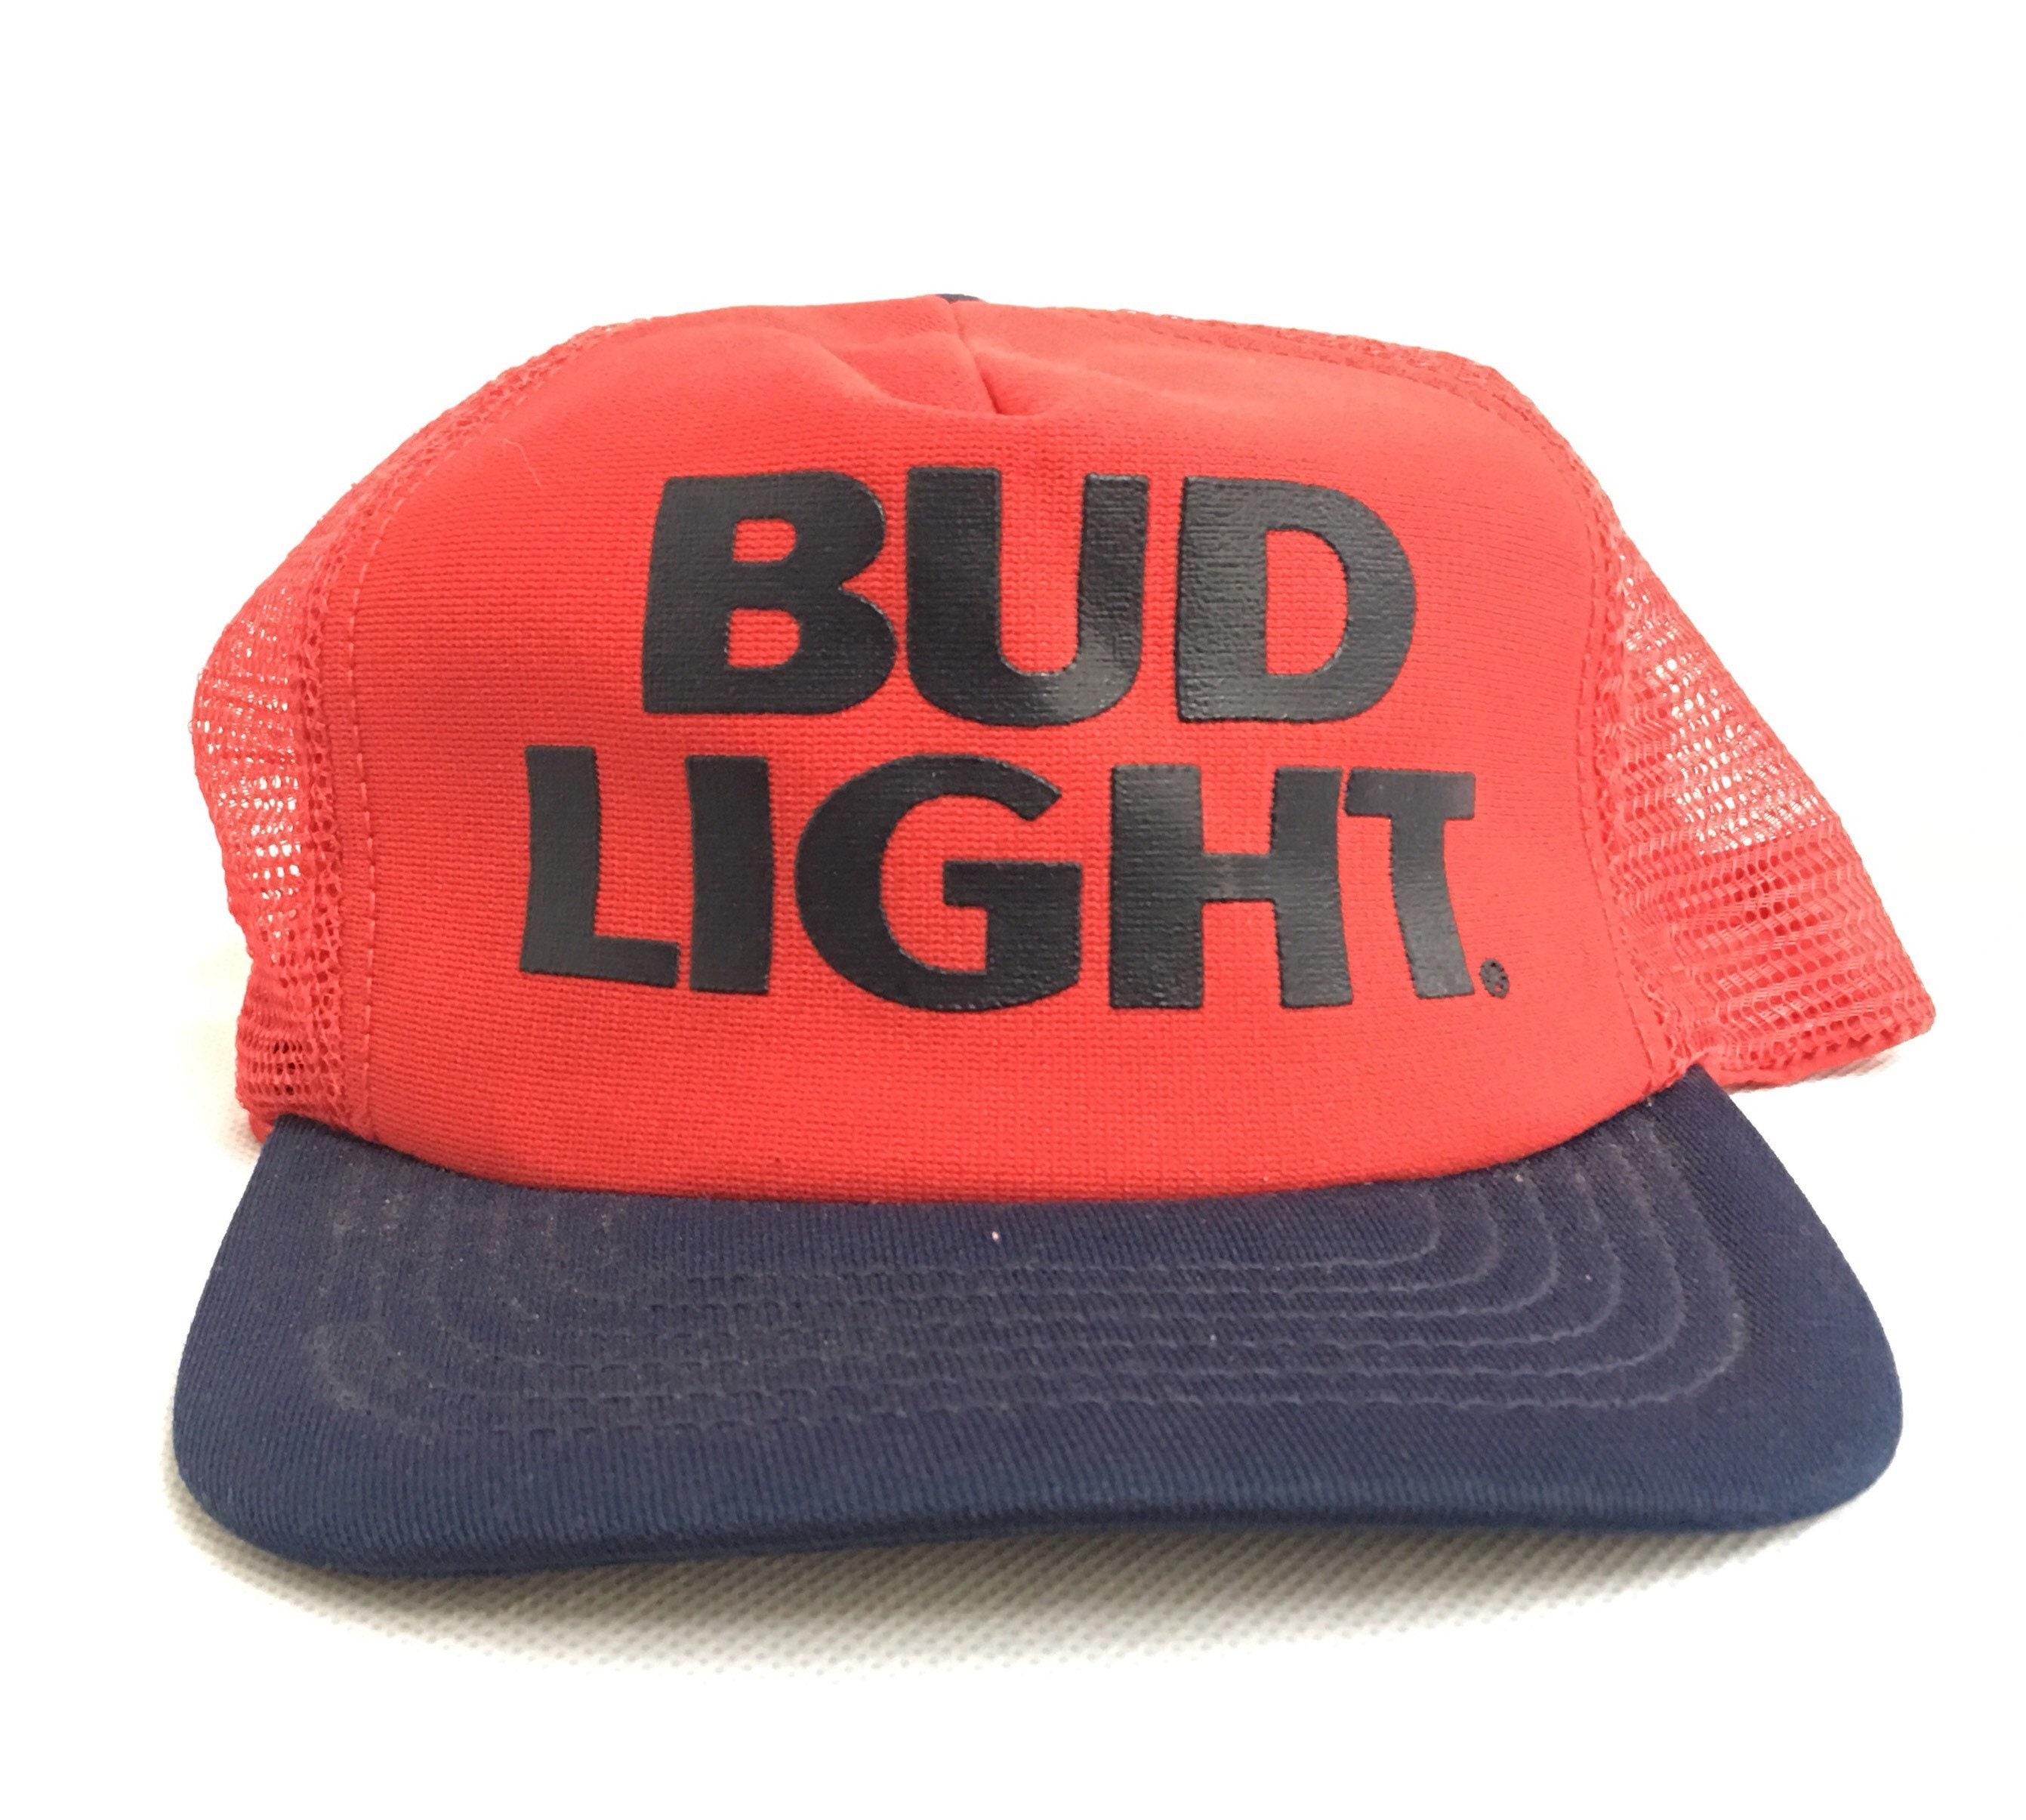 922cb7dea77dc 90s Snapback Budweiser Hat 90s Snapback Hat Budweiser